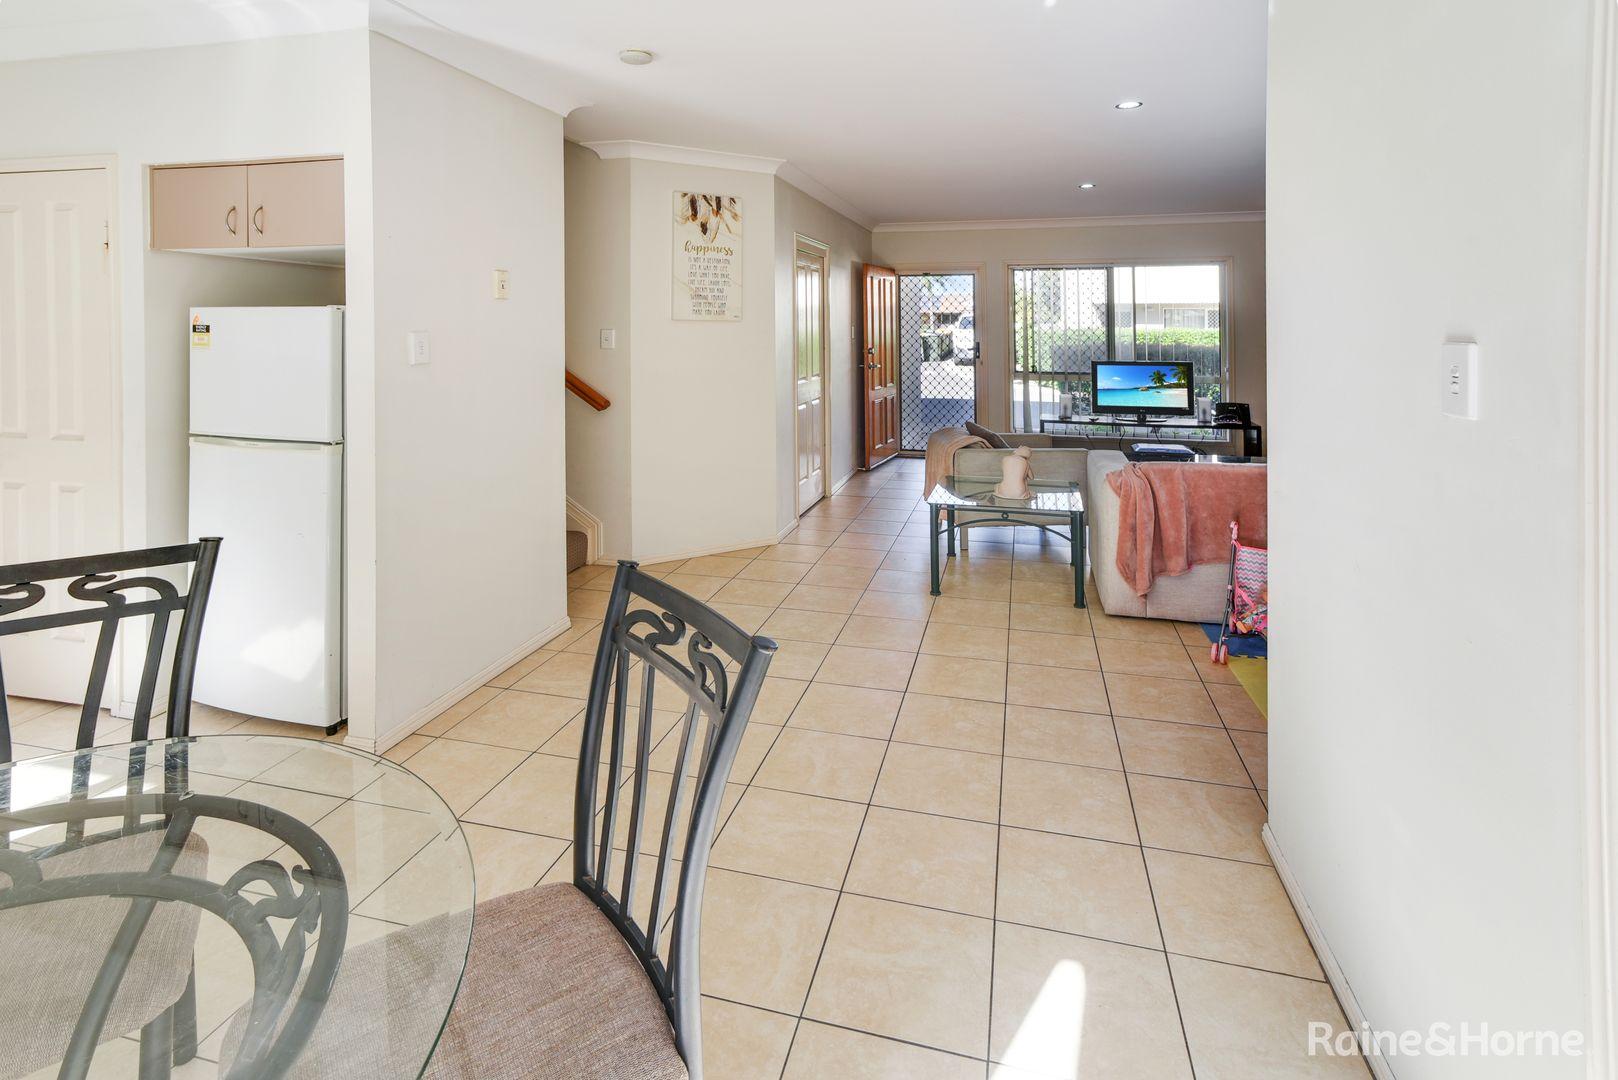 12 11 PYRANEES STREET, Calamvale QLD 4116, Image 1